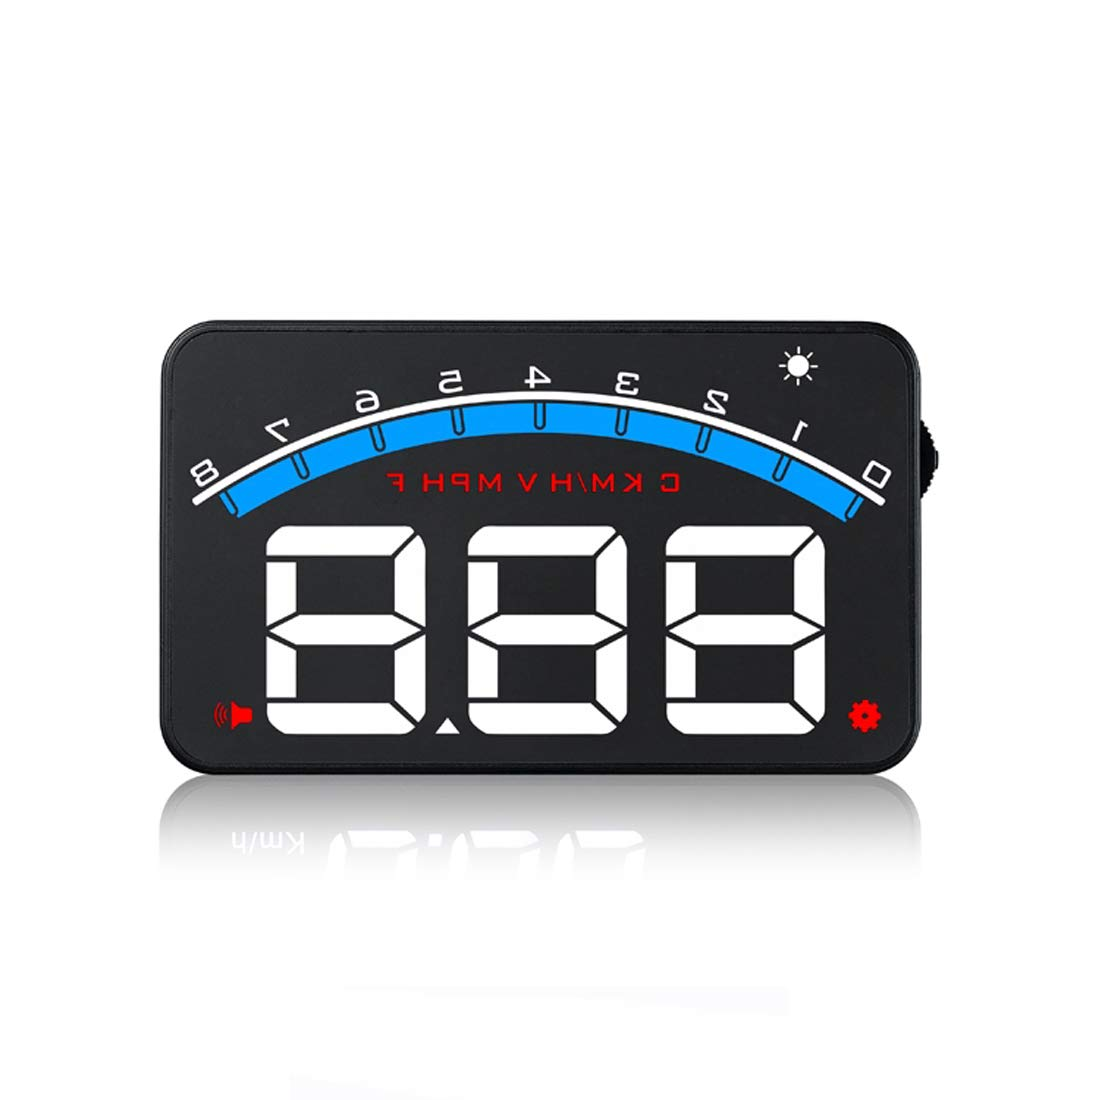 DONGMAO M6 Head Up 3, 5-Zoll-Windschutzscheibenprojektor OBD2 EUOBD Autofahrdatenanzeige Geschwindigkeit RPM Wassertemperatur HUD-Anzeige HONGKANG DONGMAO CO LTD